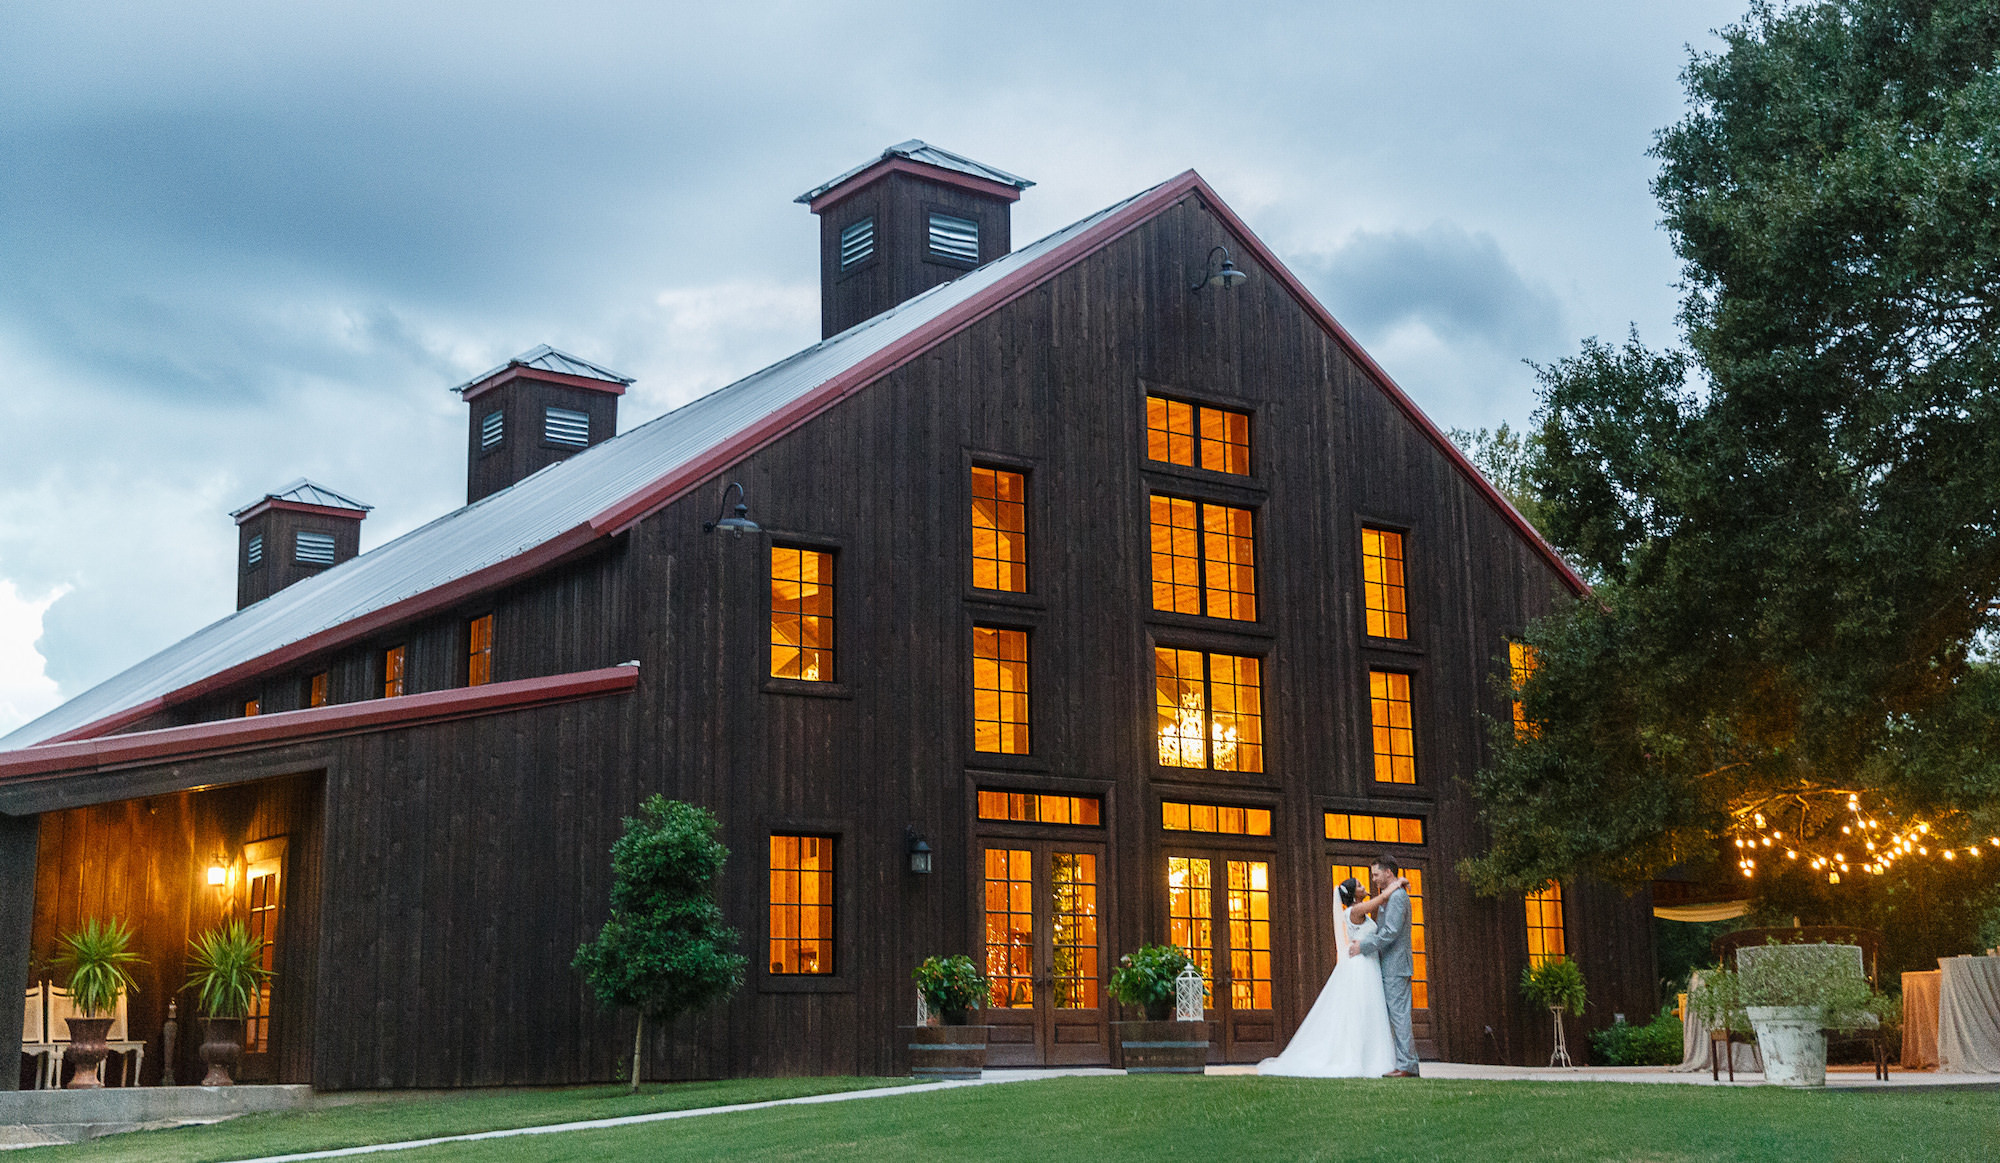 A Rustic Elegant Barn Wedding Venue Outside Houston Texas